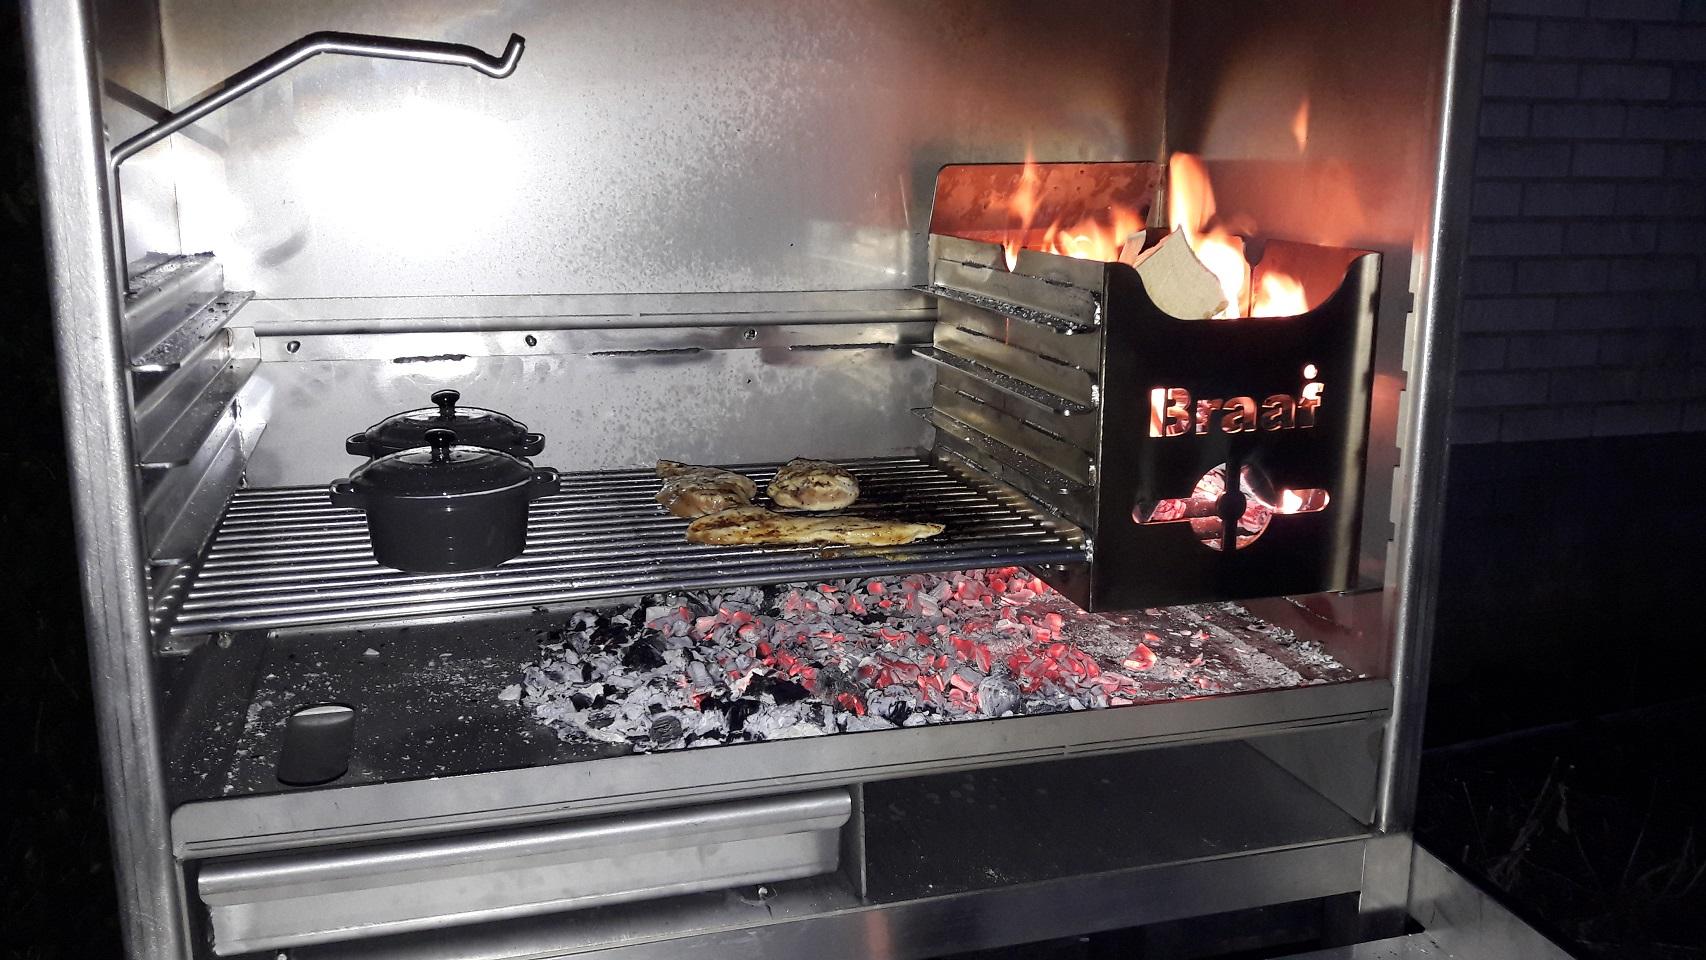 Braai inbouw-model houtskool-bbq, pizza-oven en houtkachel in 1